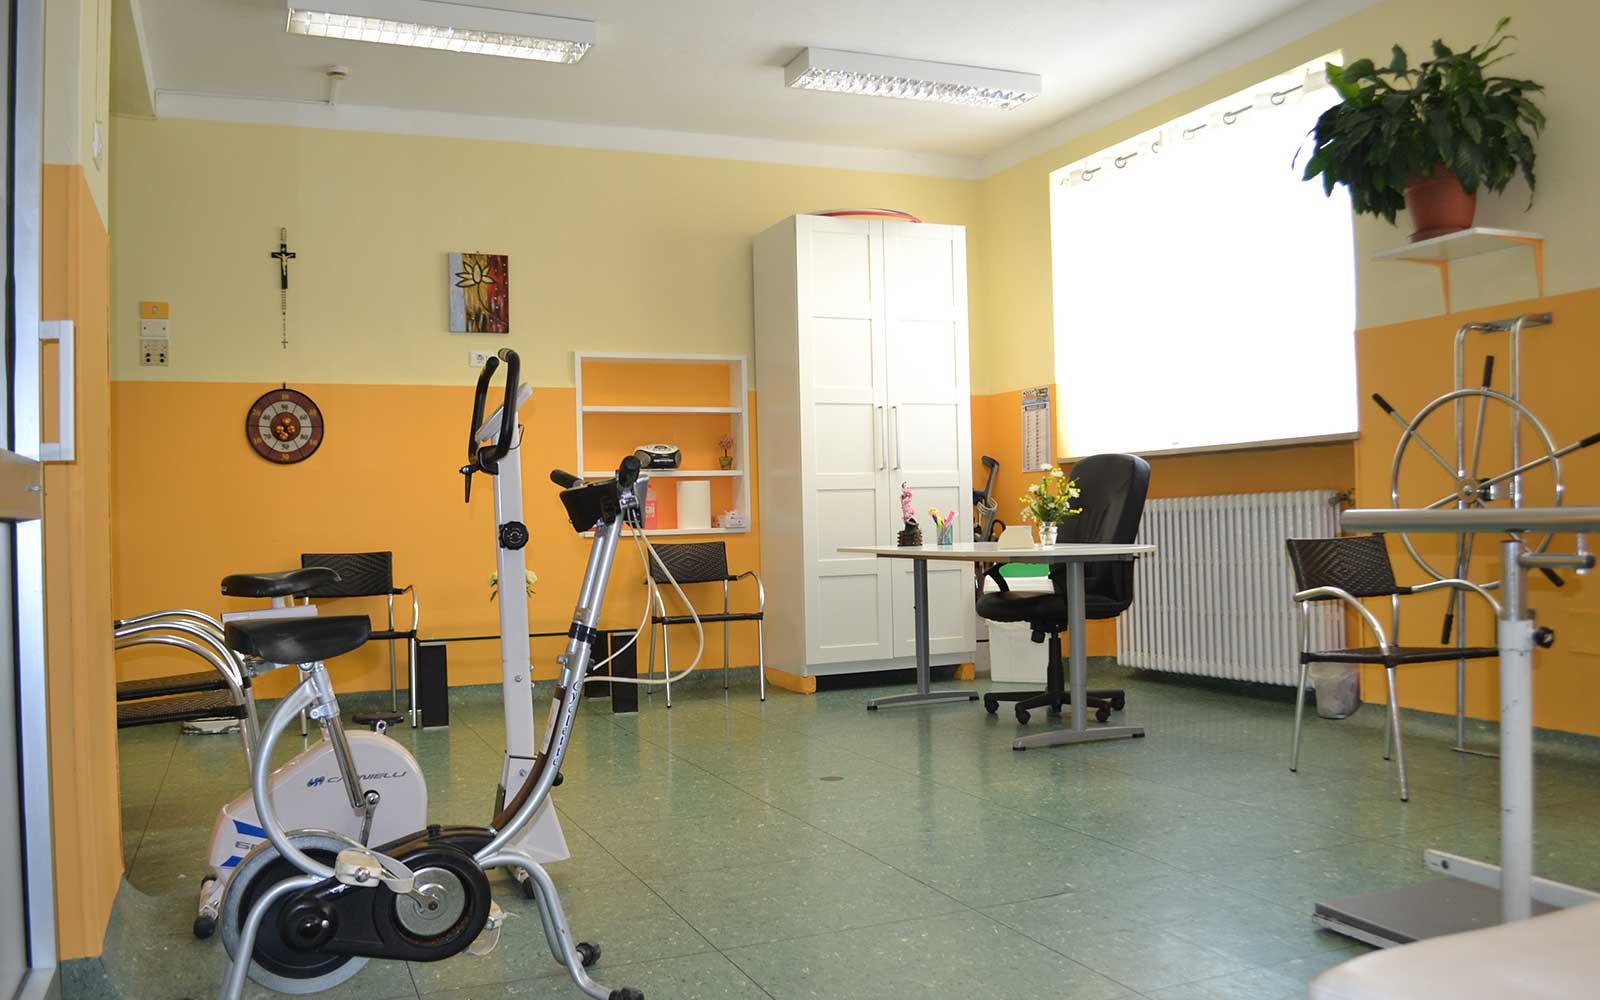 una cyclette e altri attrezzi per ginnastica riabilitativa